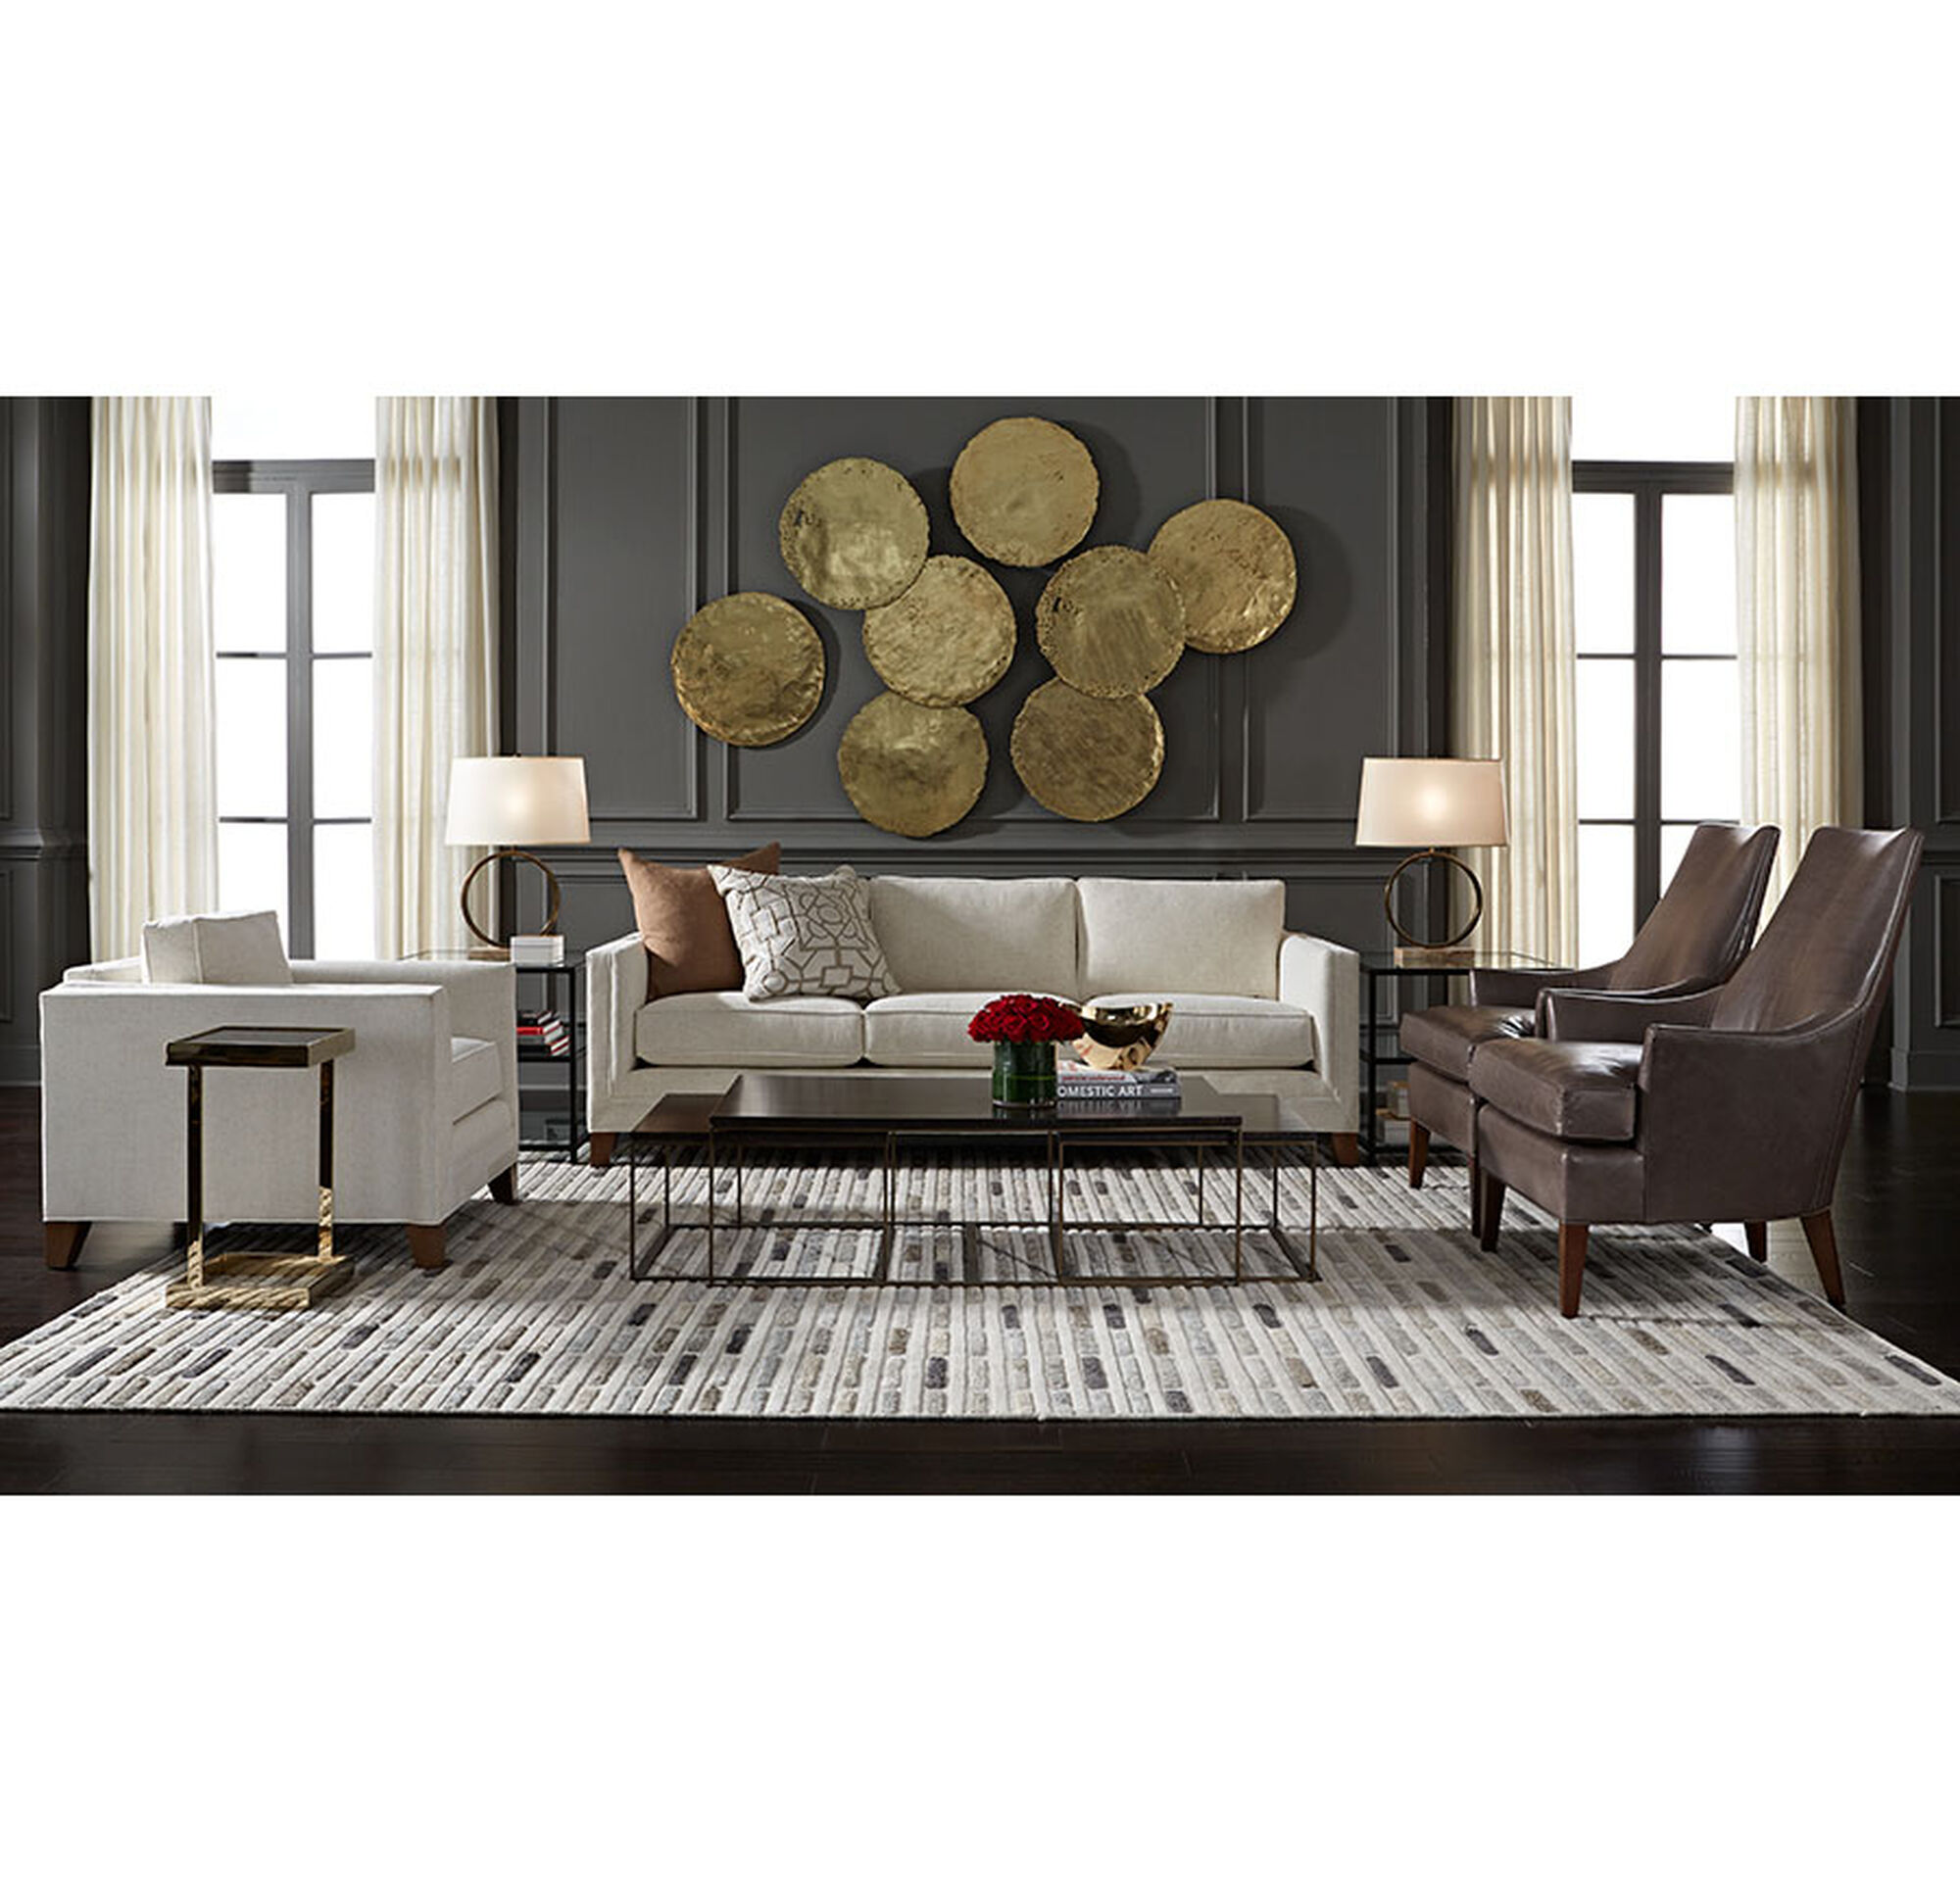 Symmetry Furniture symmetry rug